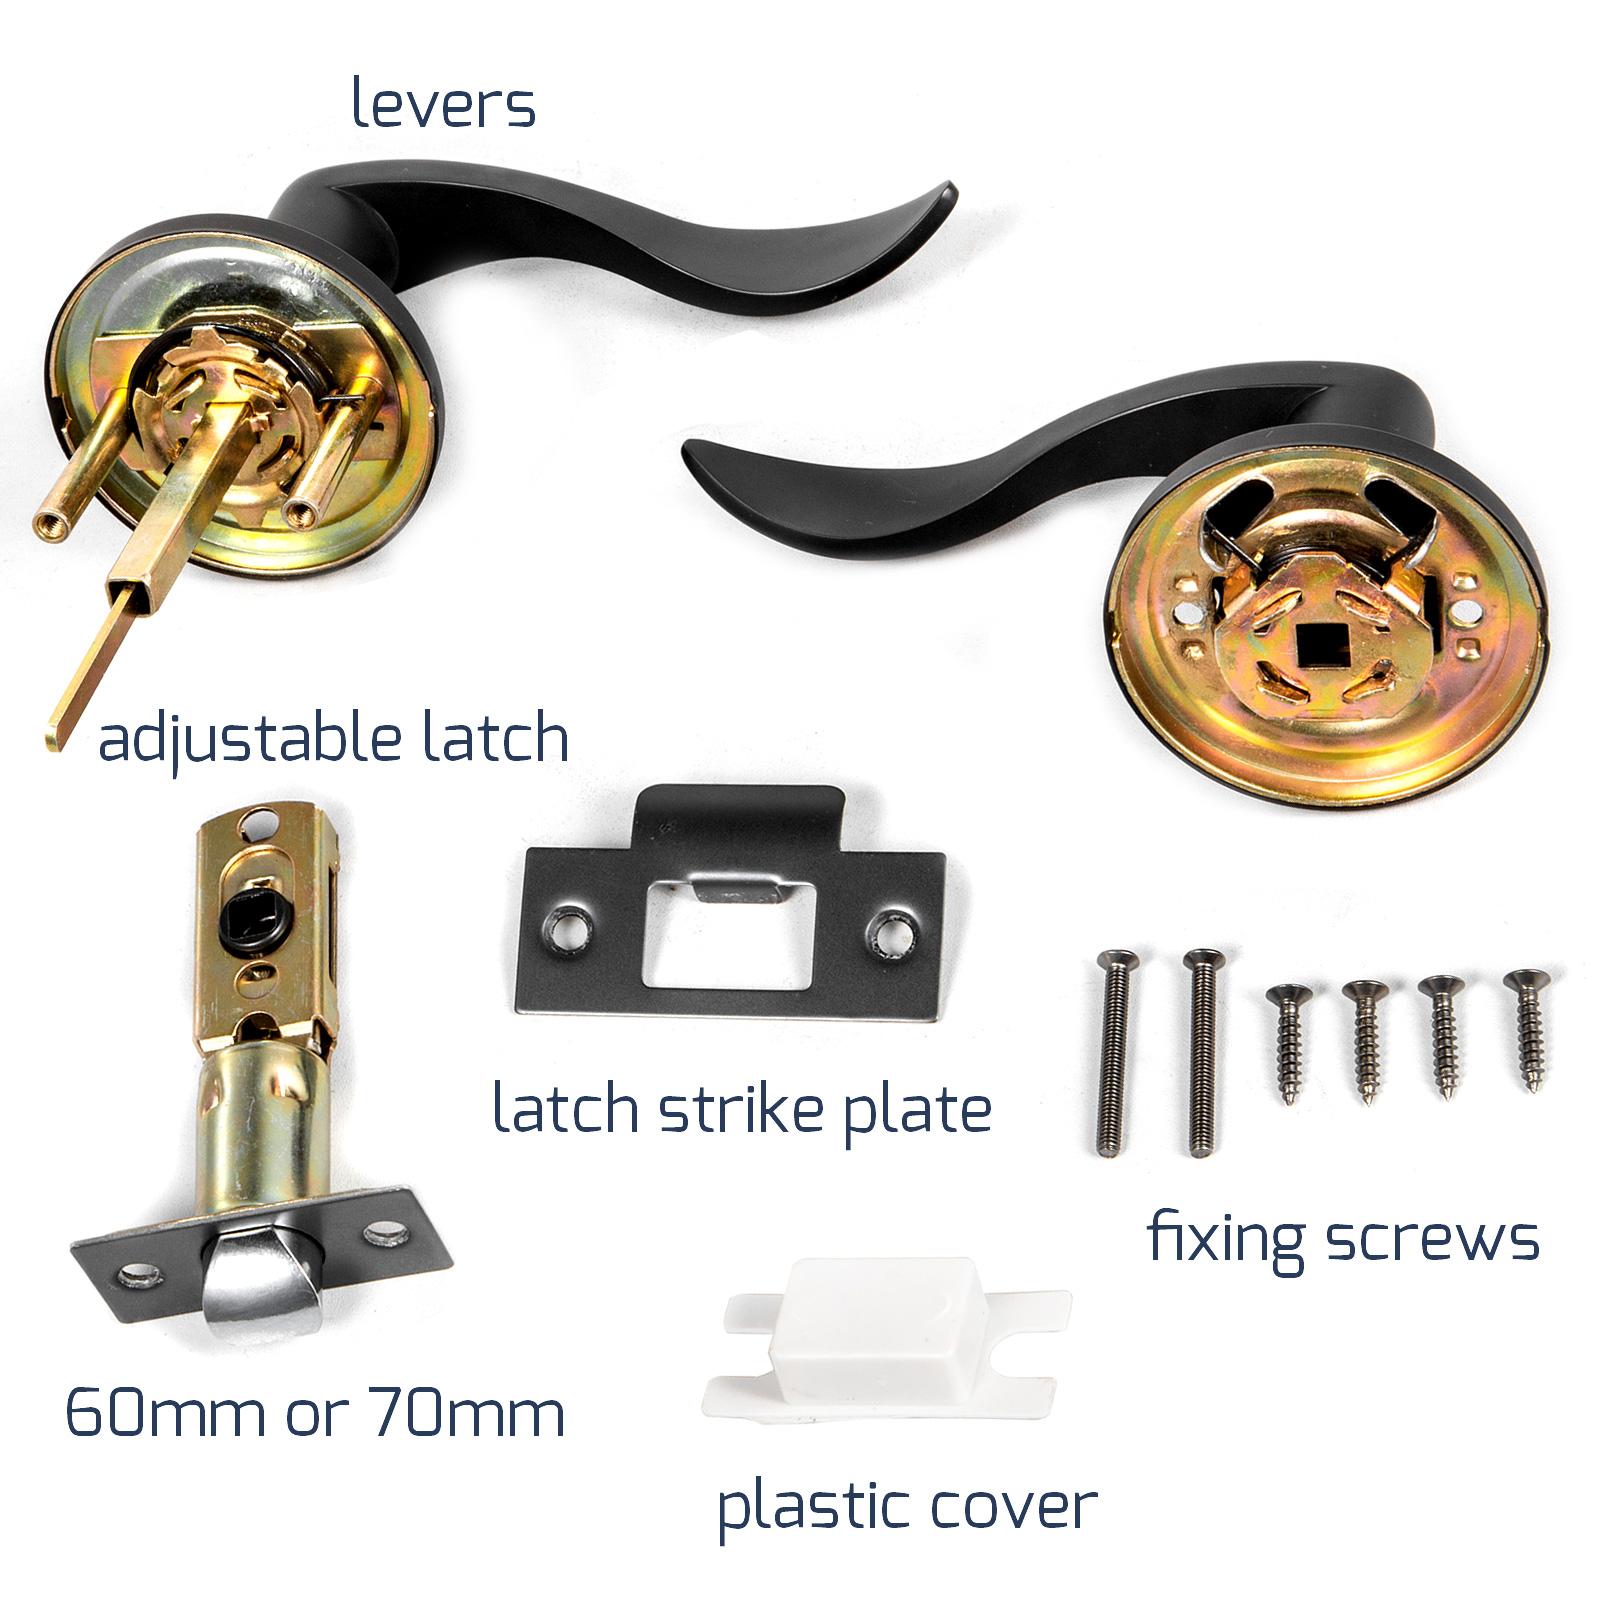 Door-Handles-Matte-Black-Door-Lever-3-5-10-Pack-Passage-Privace-Entry-Lock-Set thumbnail 21